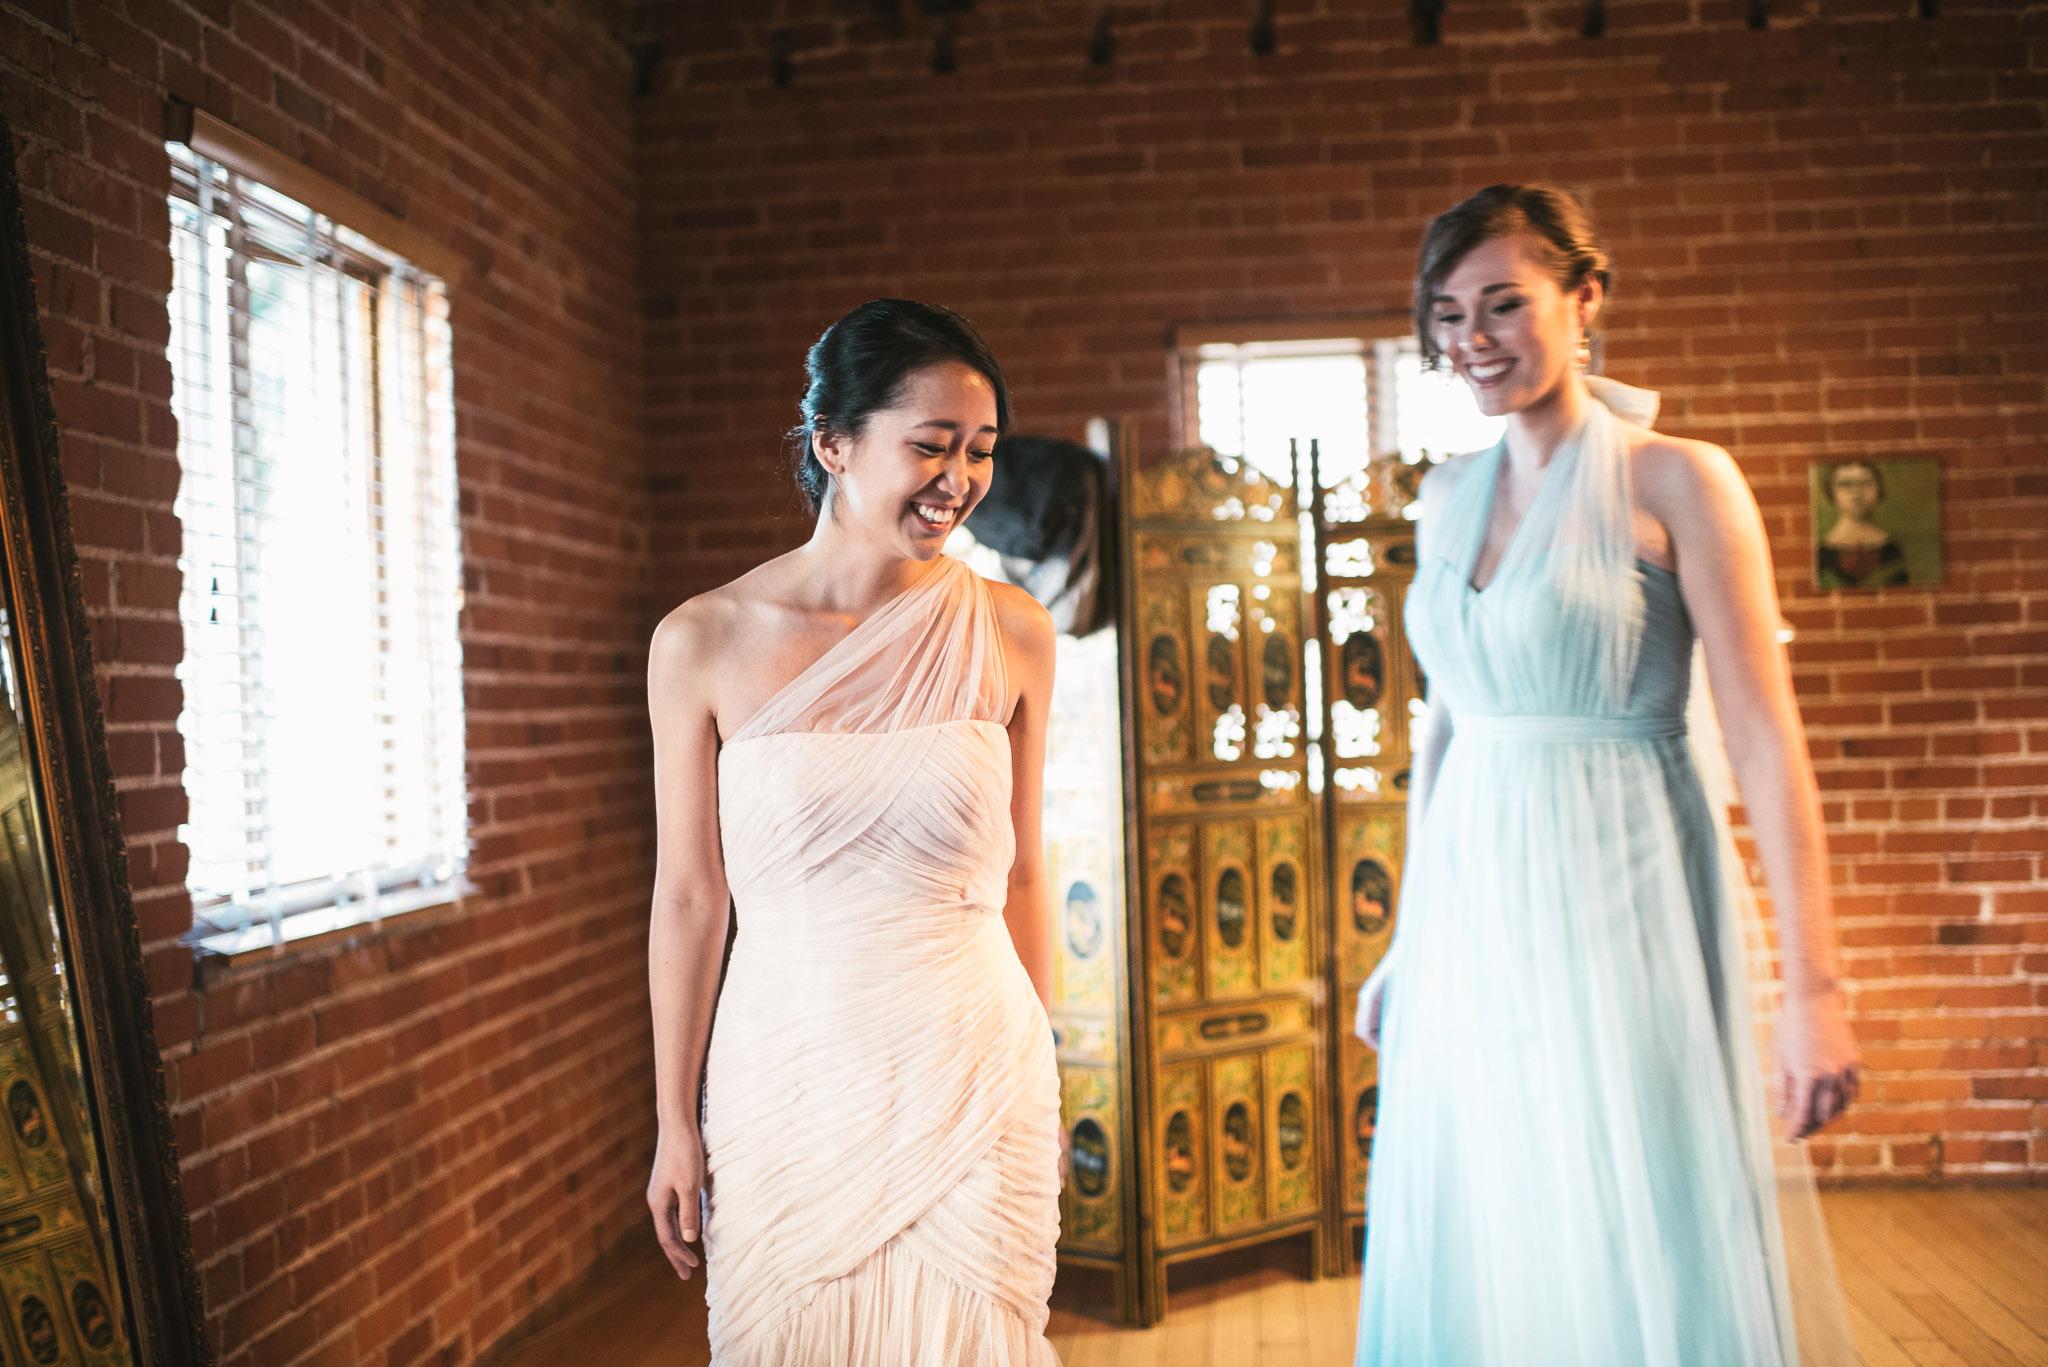 brian hana wedding106.jpg